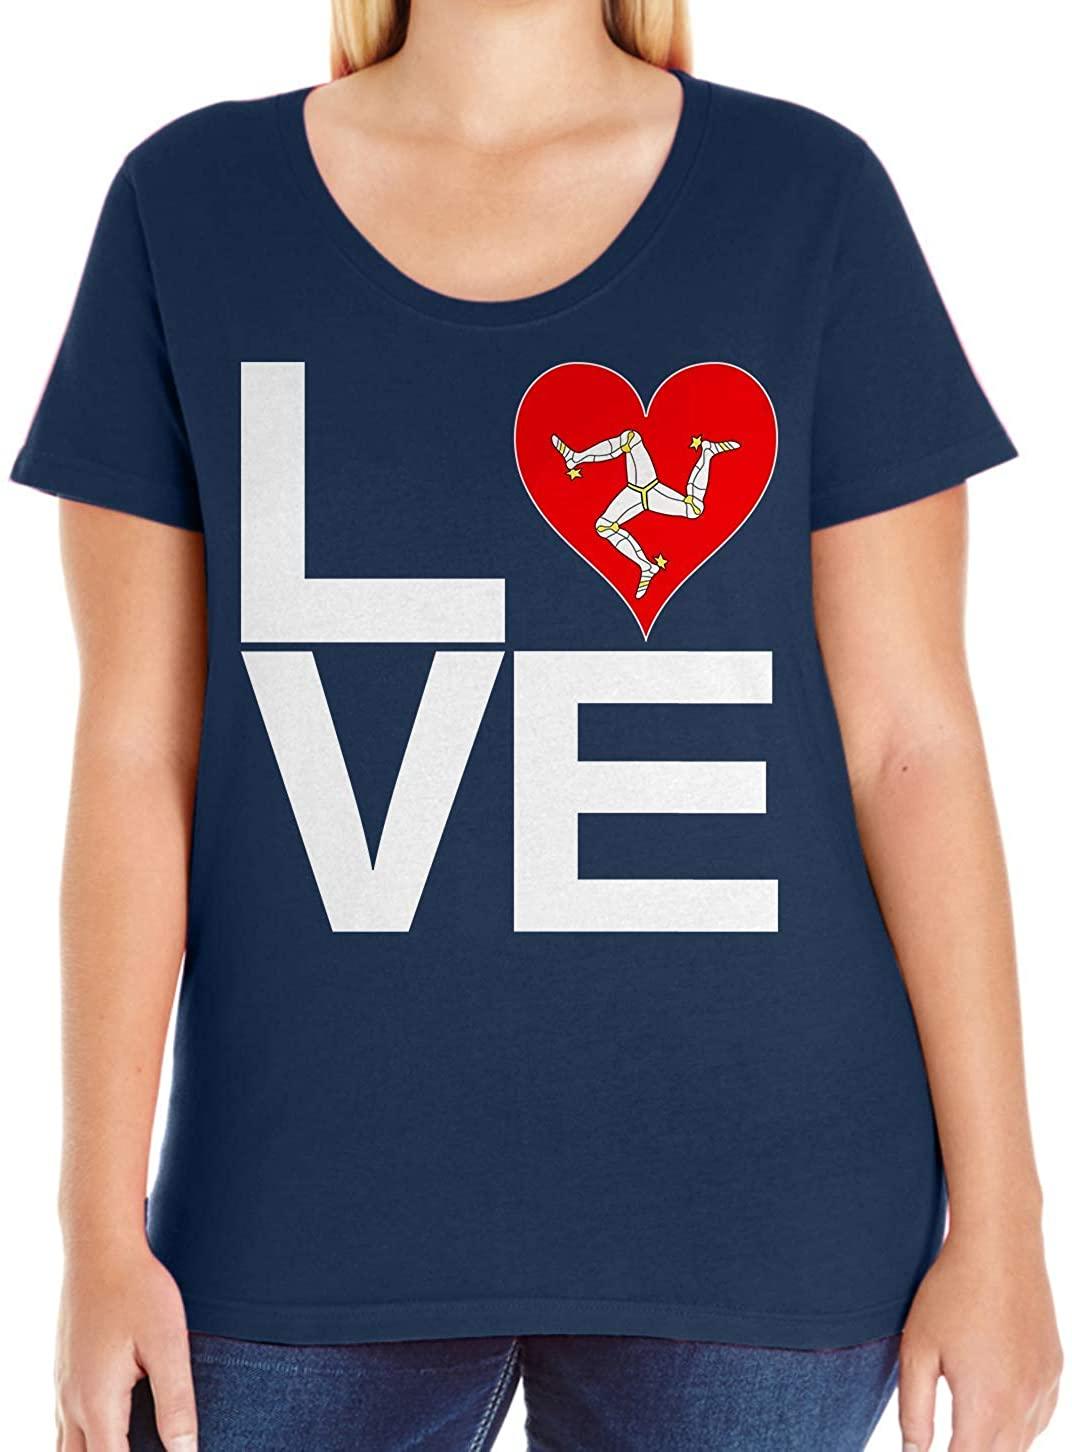 Tenacitee Women's Love Block Isle of Man Heart T-Shirt